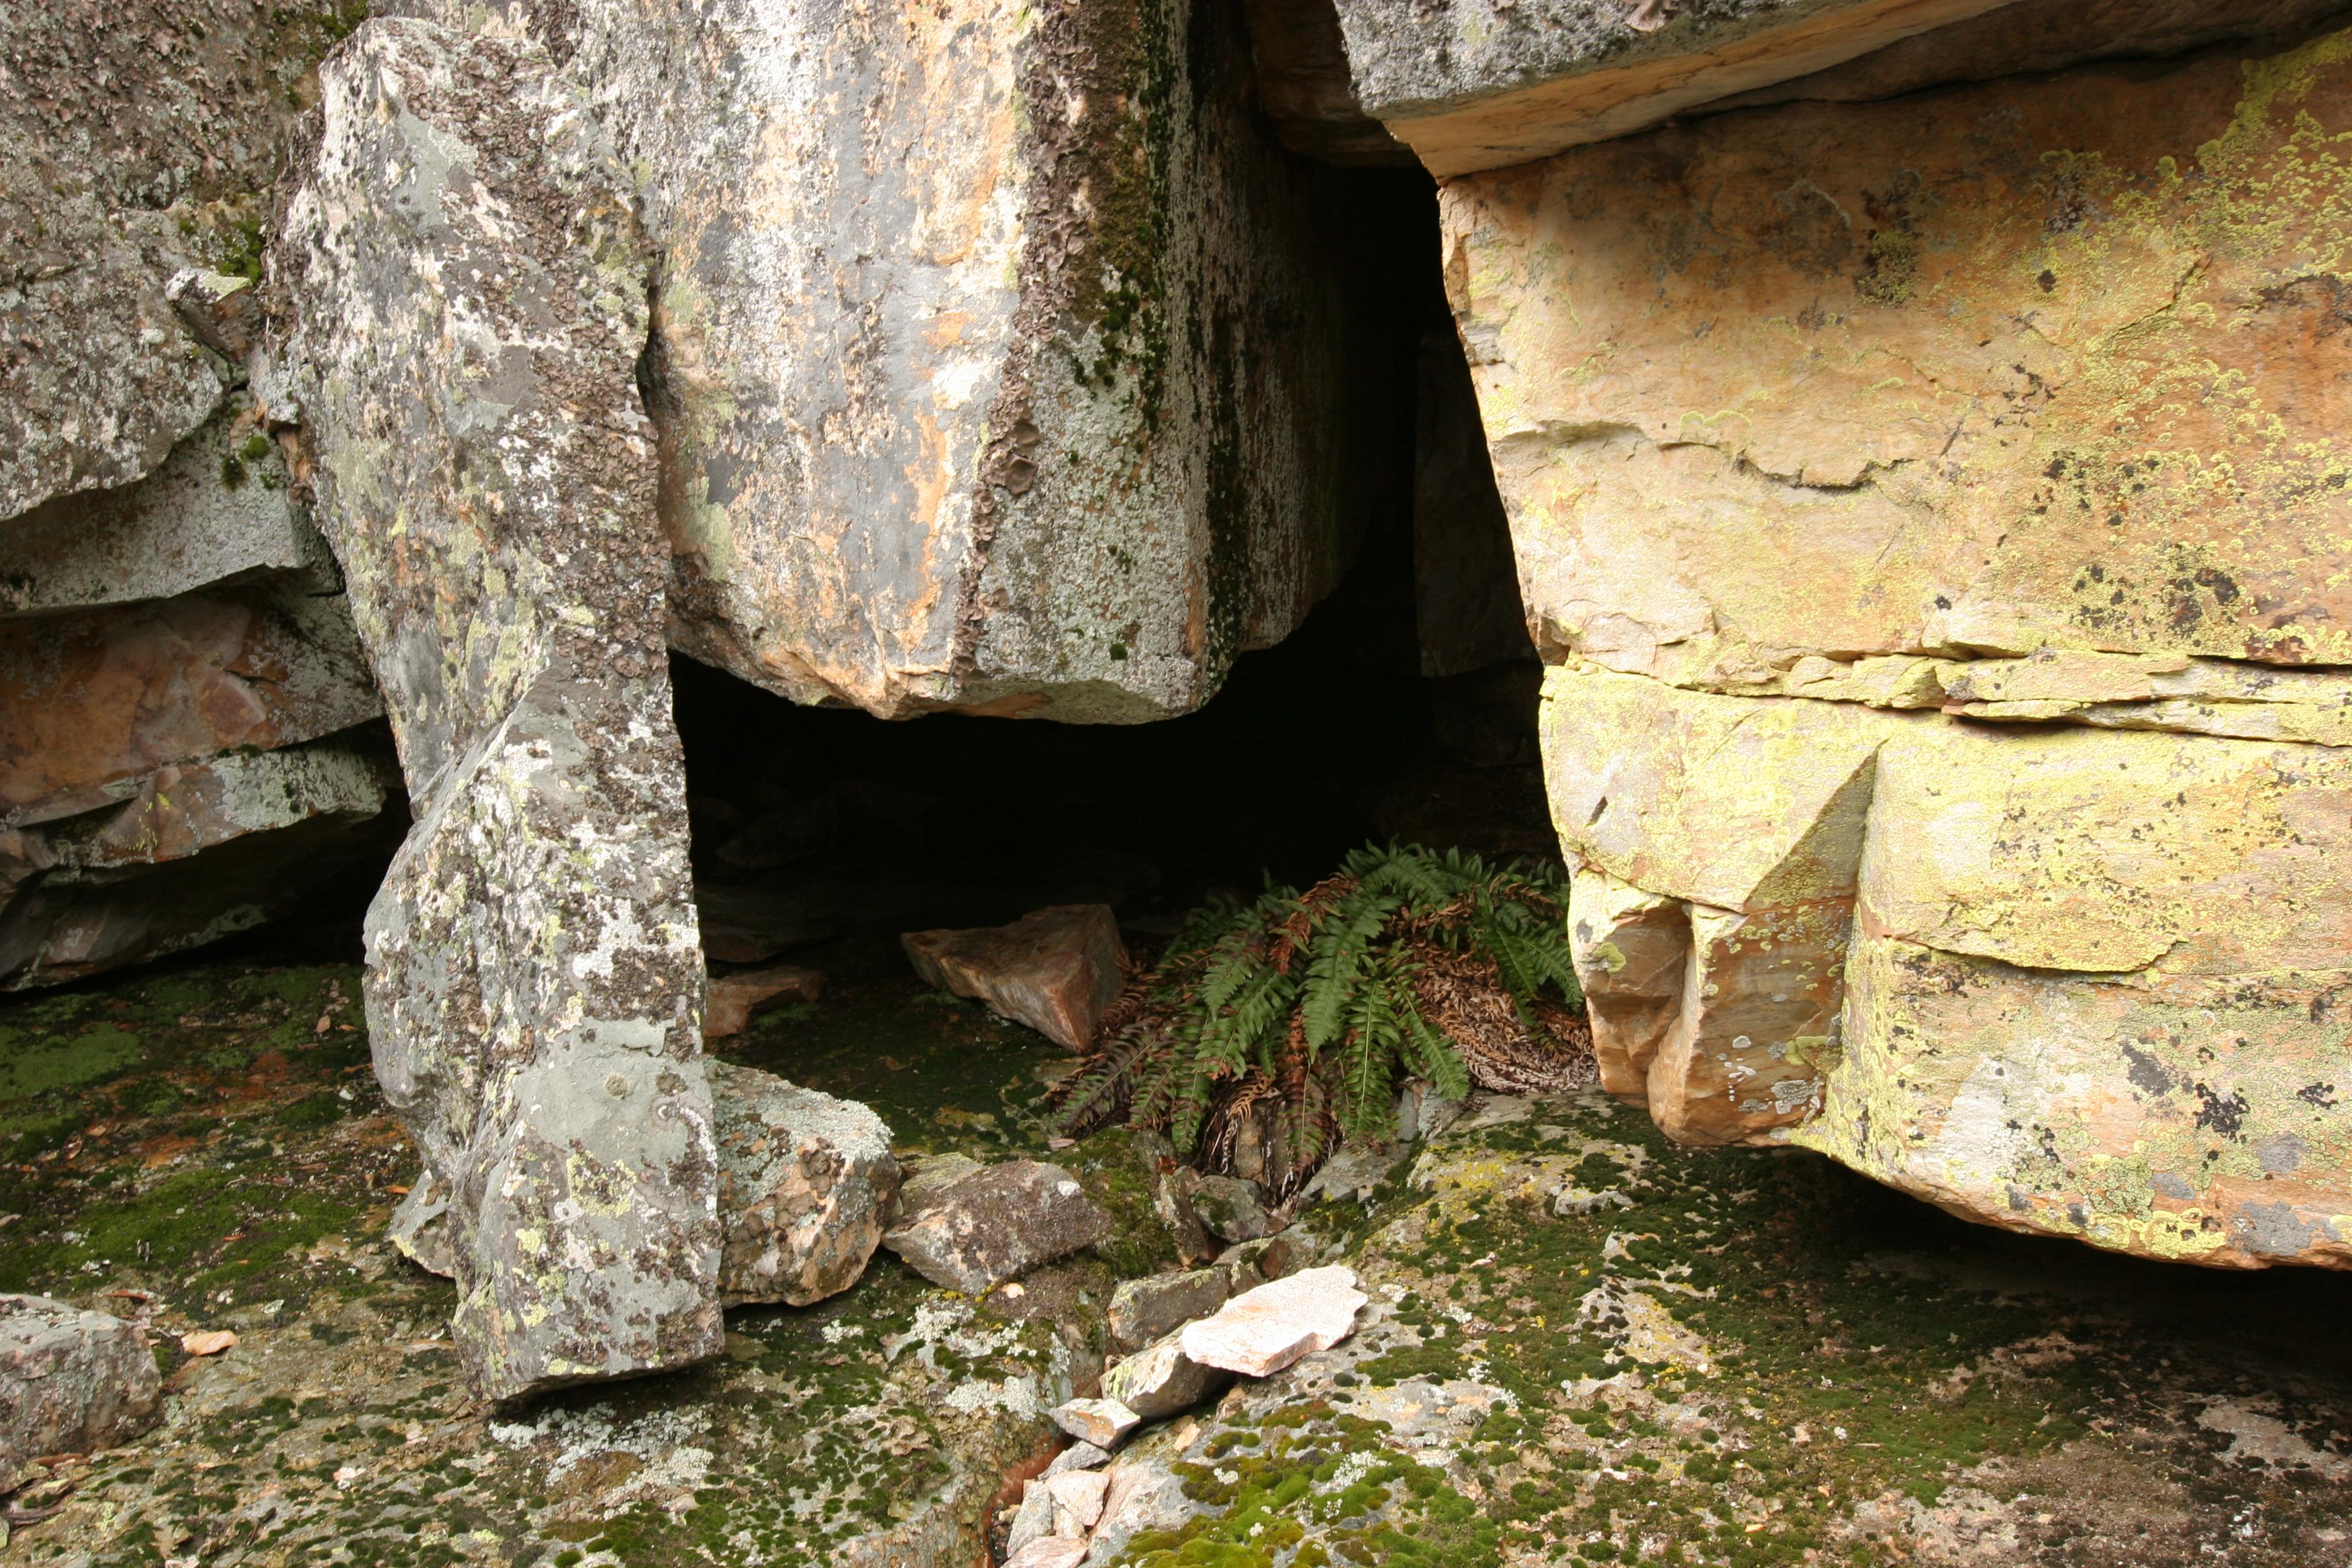 Arnold Rim Trail « Snapshots by Kats